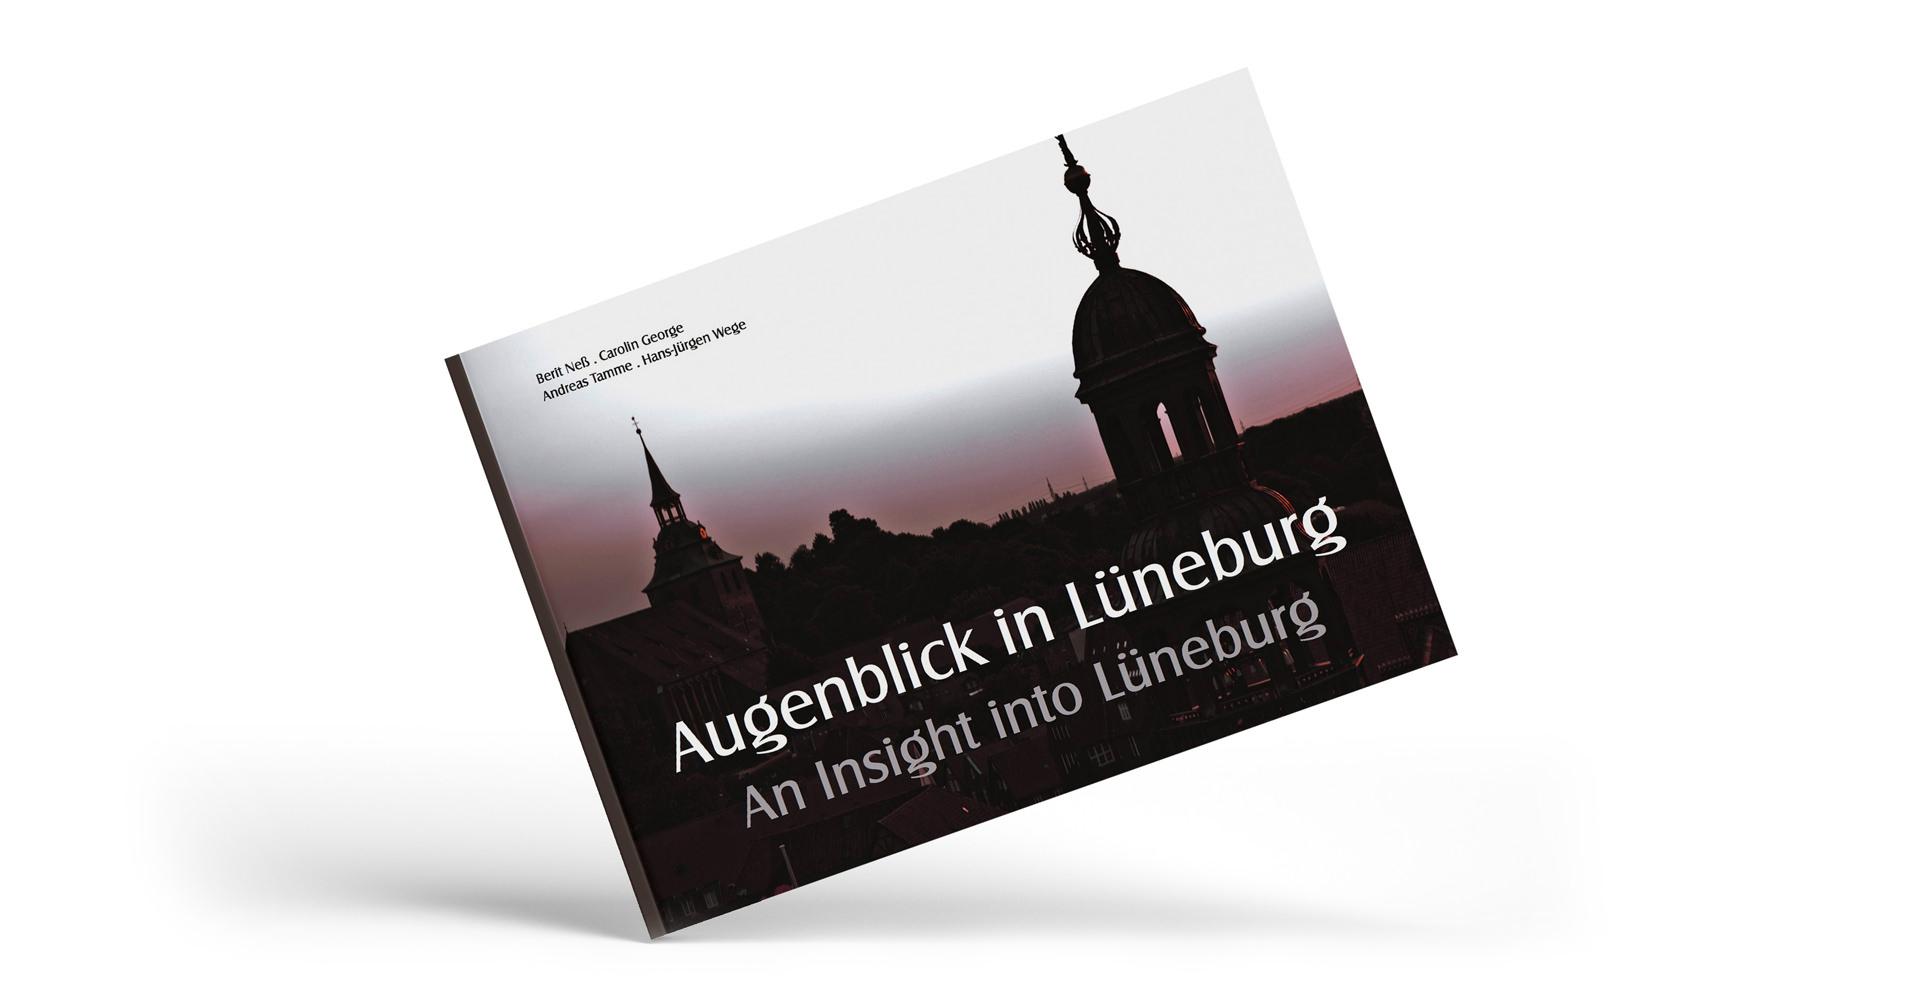 Augenblick in Lüneburg